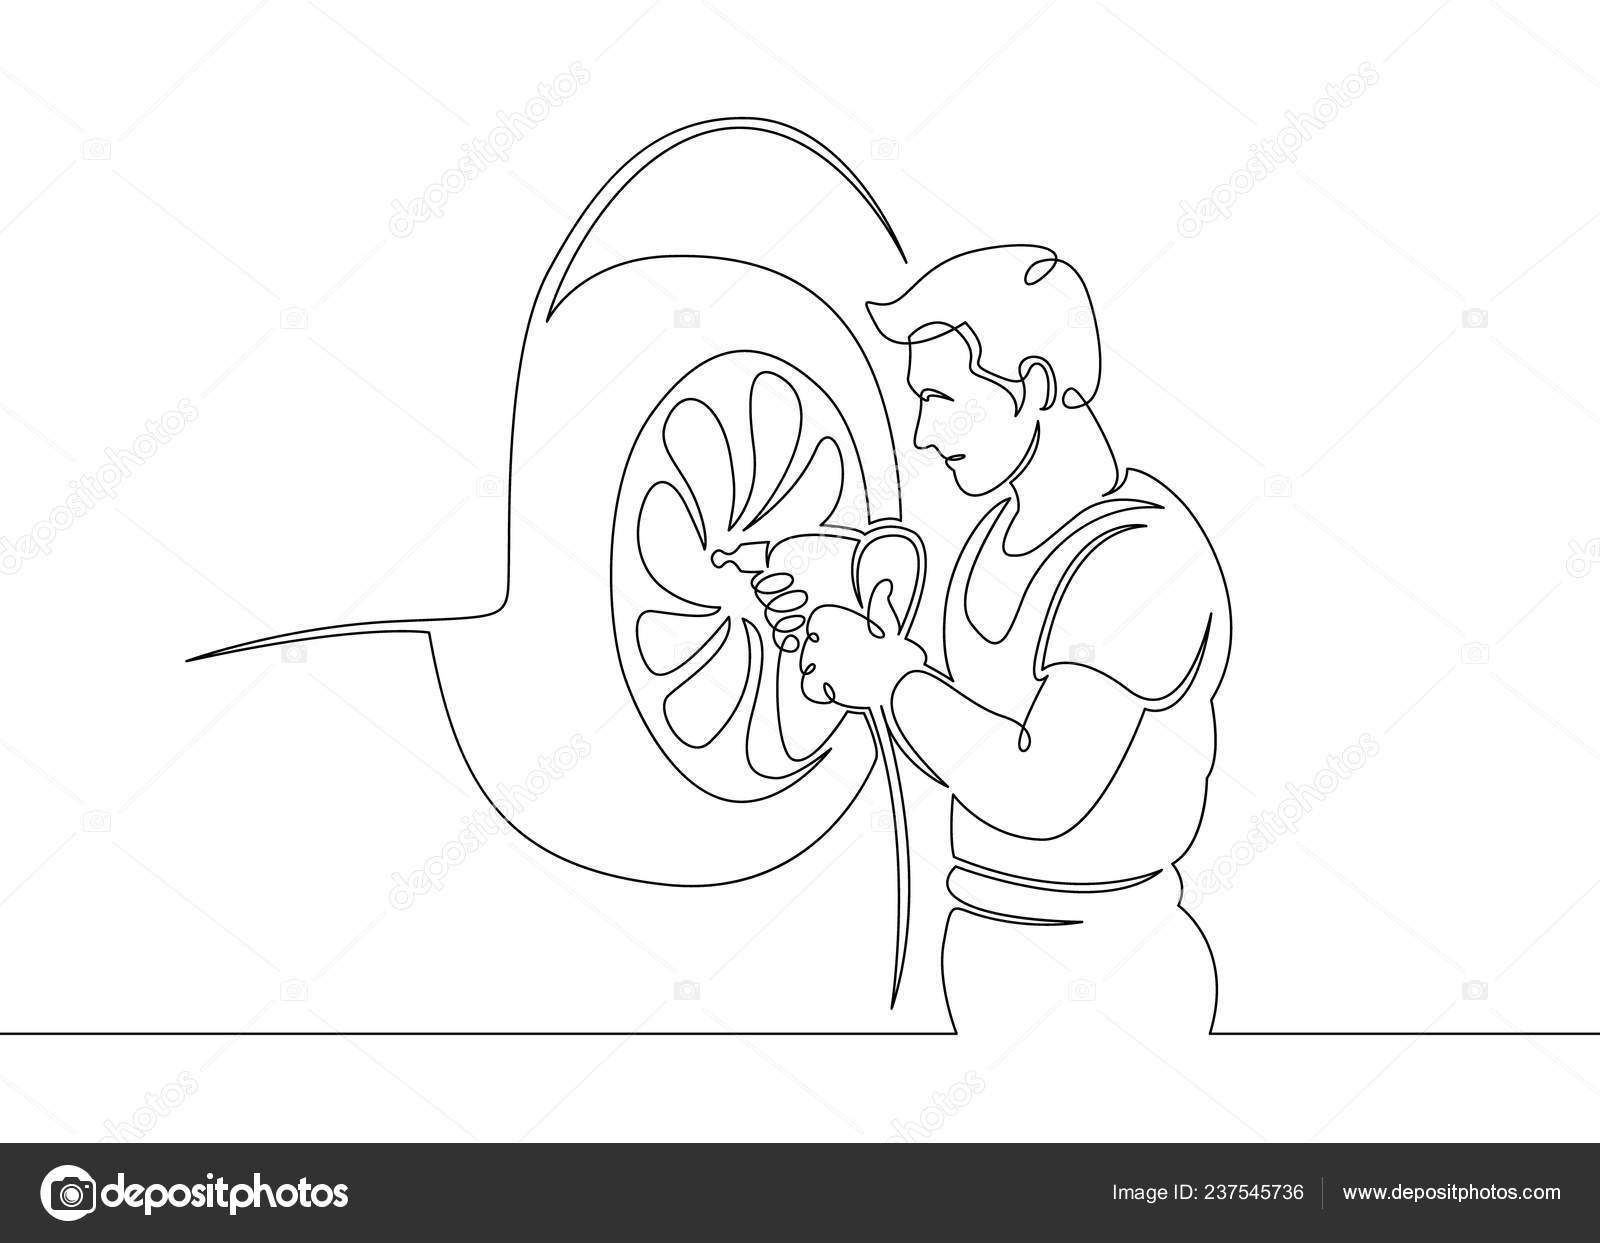 auto repair on line